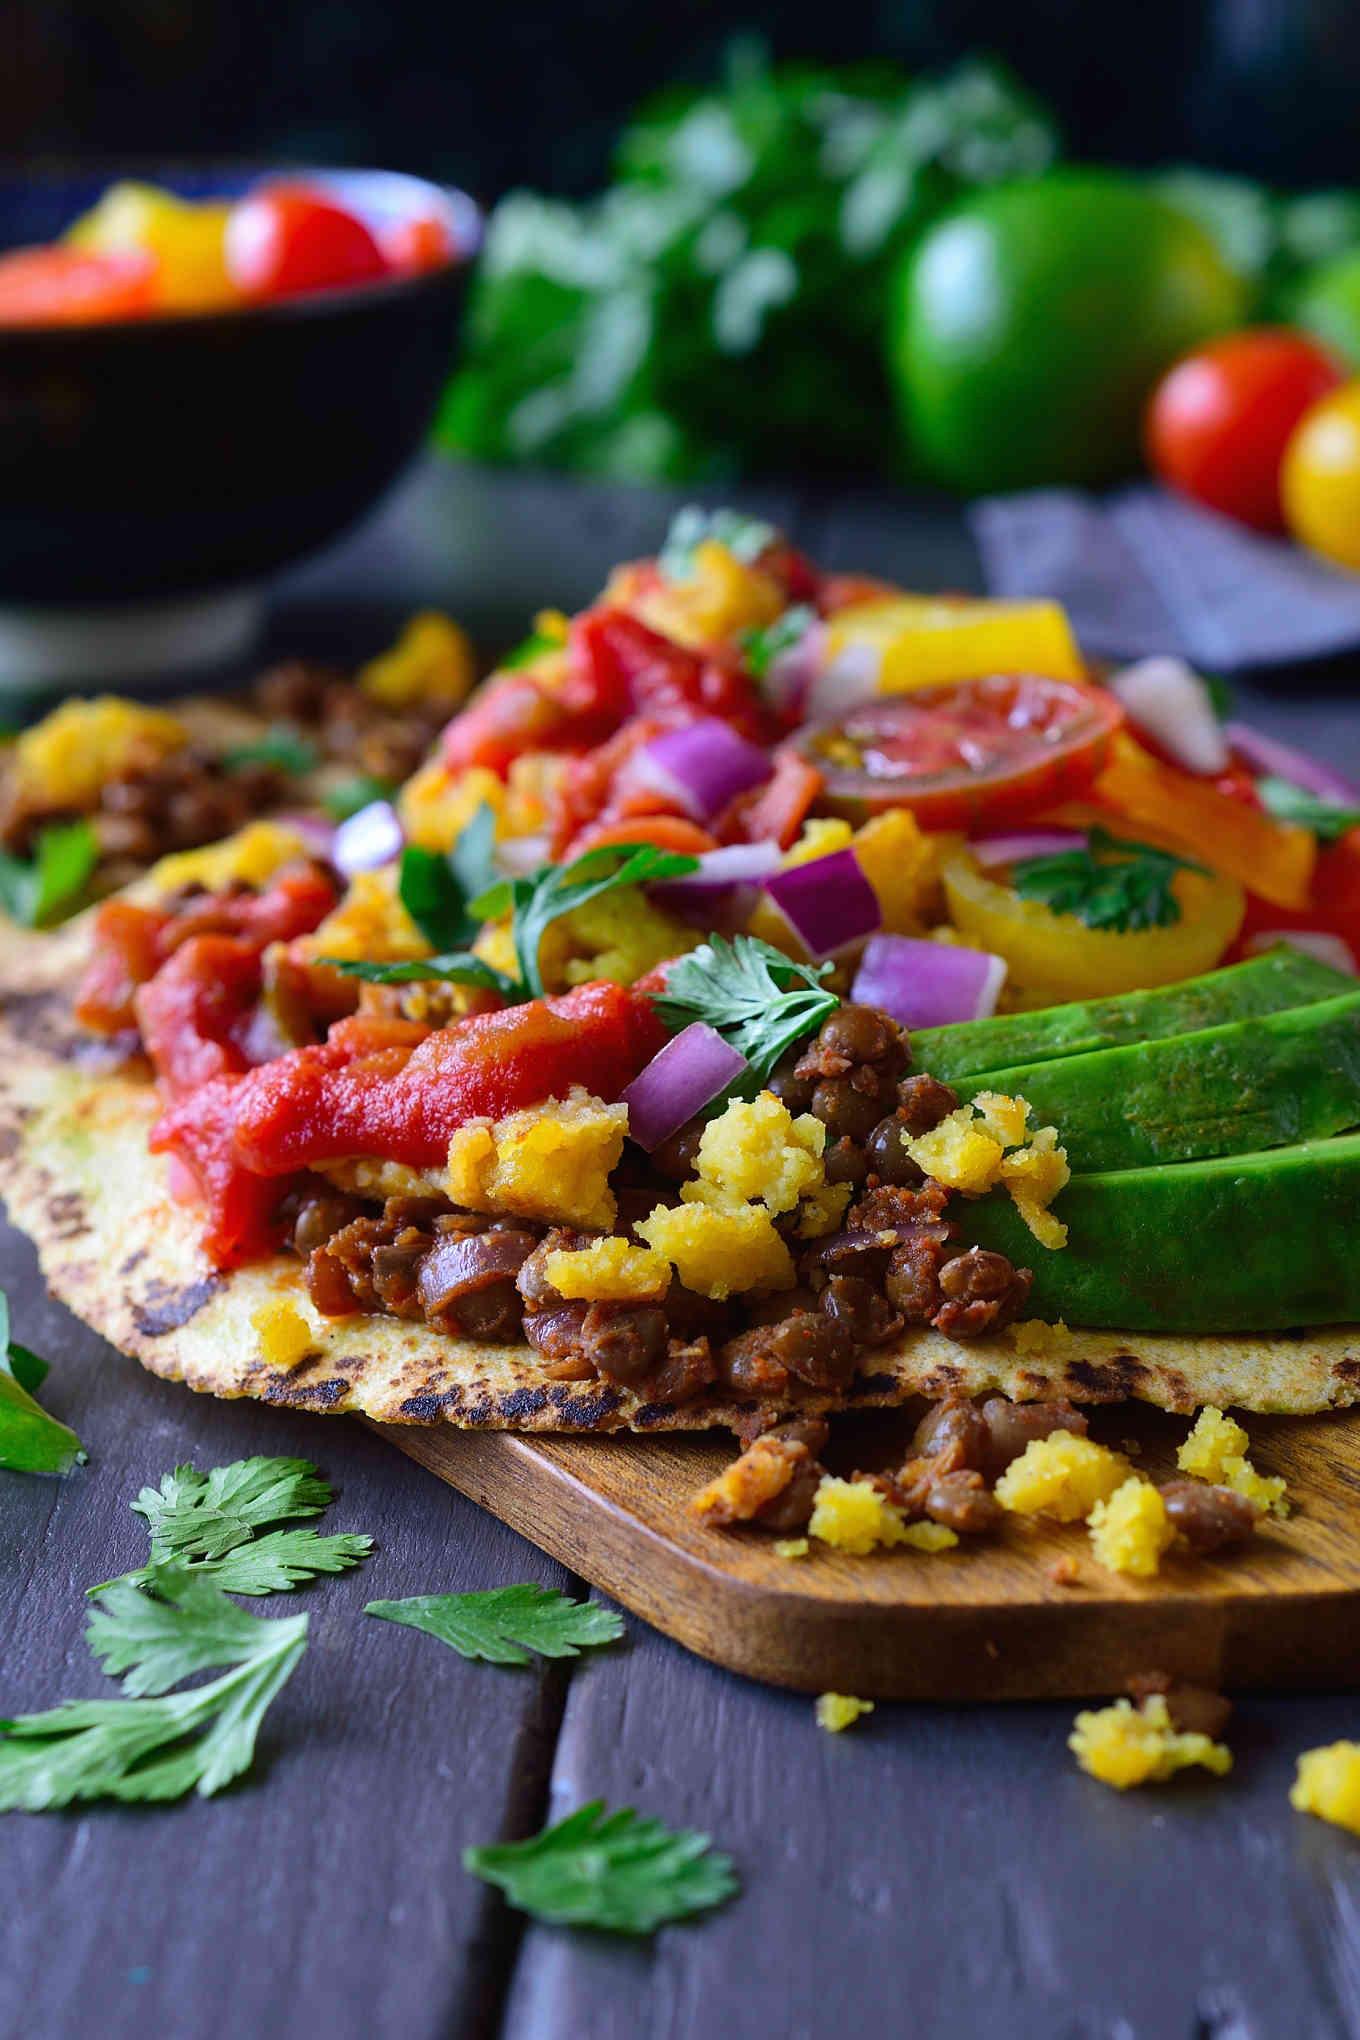 Vegetarian Protein Breakfast  11 High Protein Breakfast Ideas GreenBlender